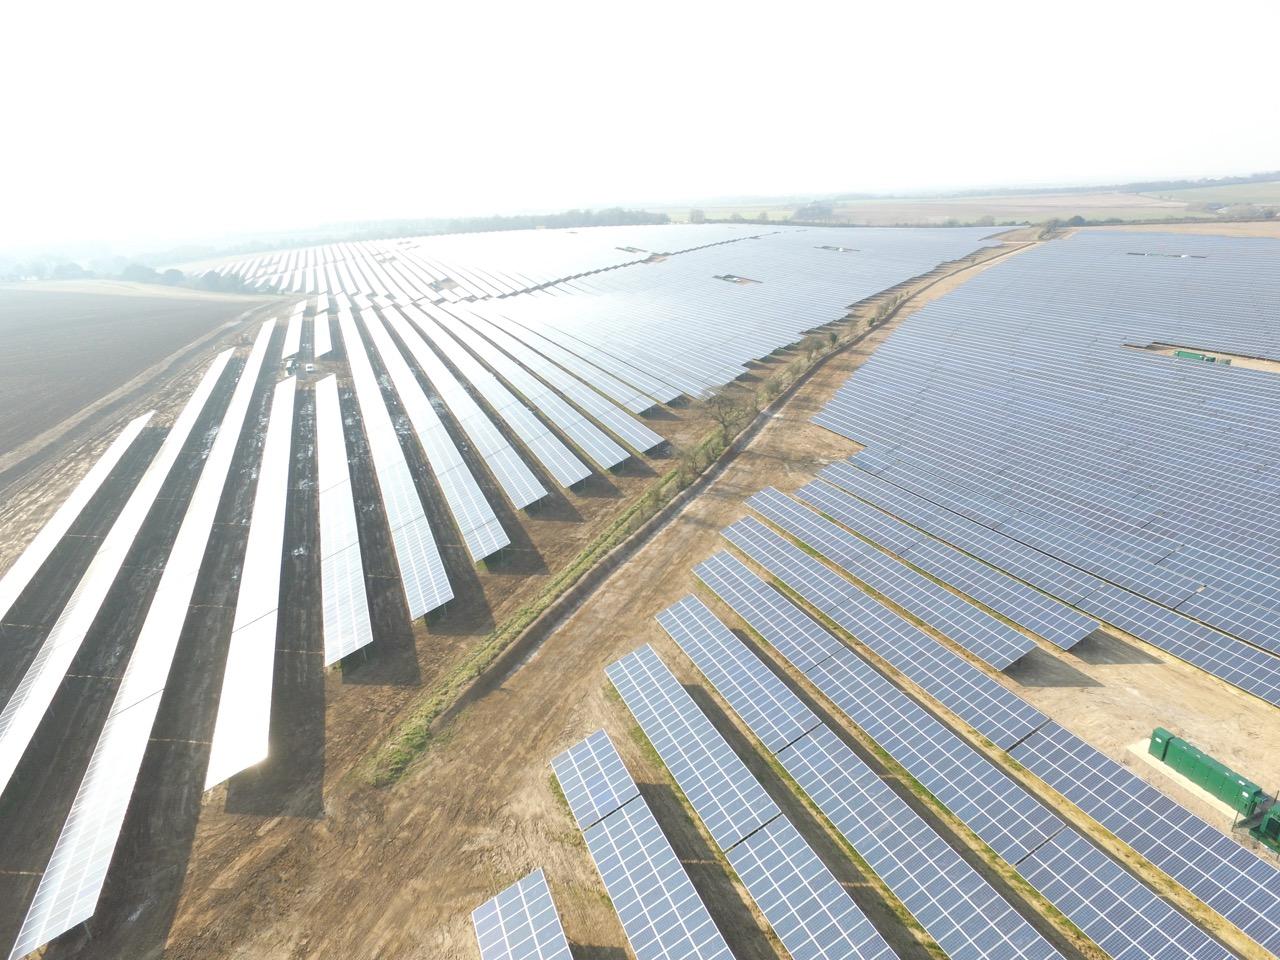 Primrose solar refinances 49MW solar farm six months after purchase